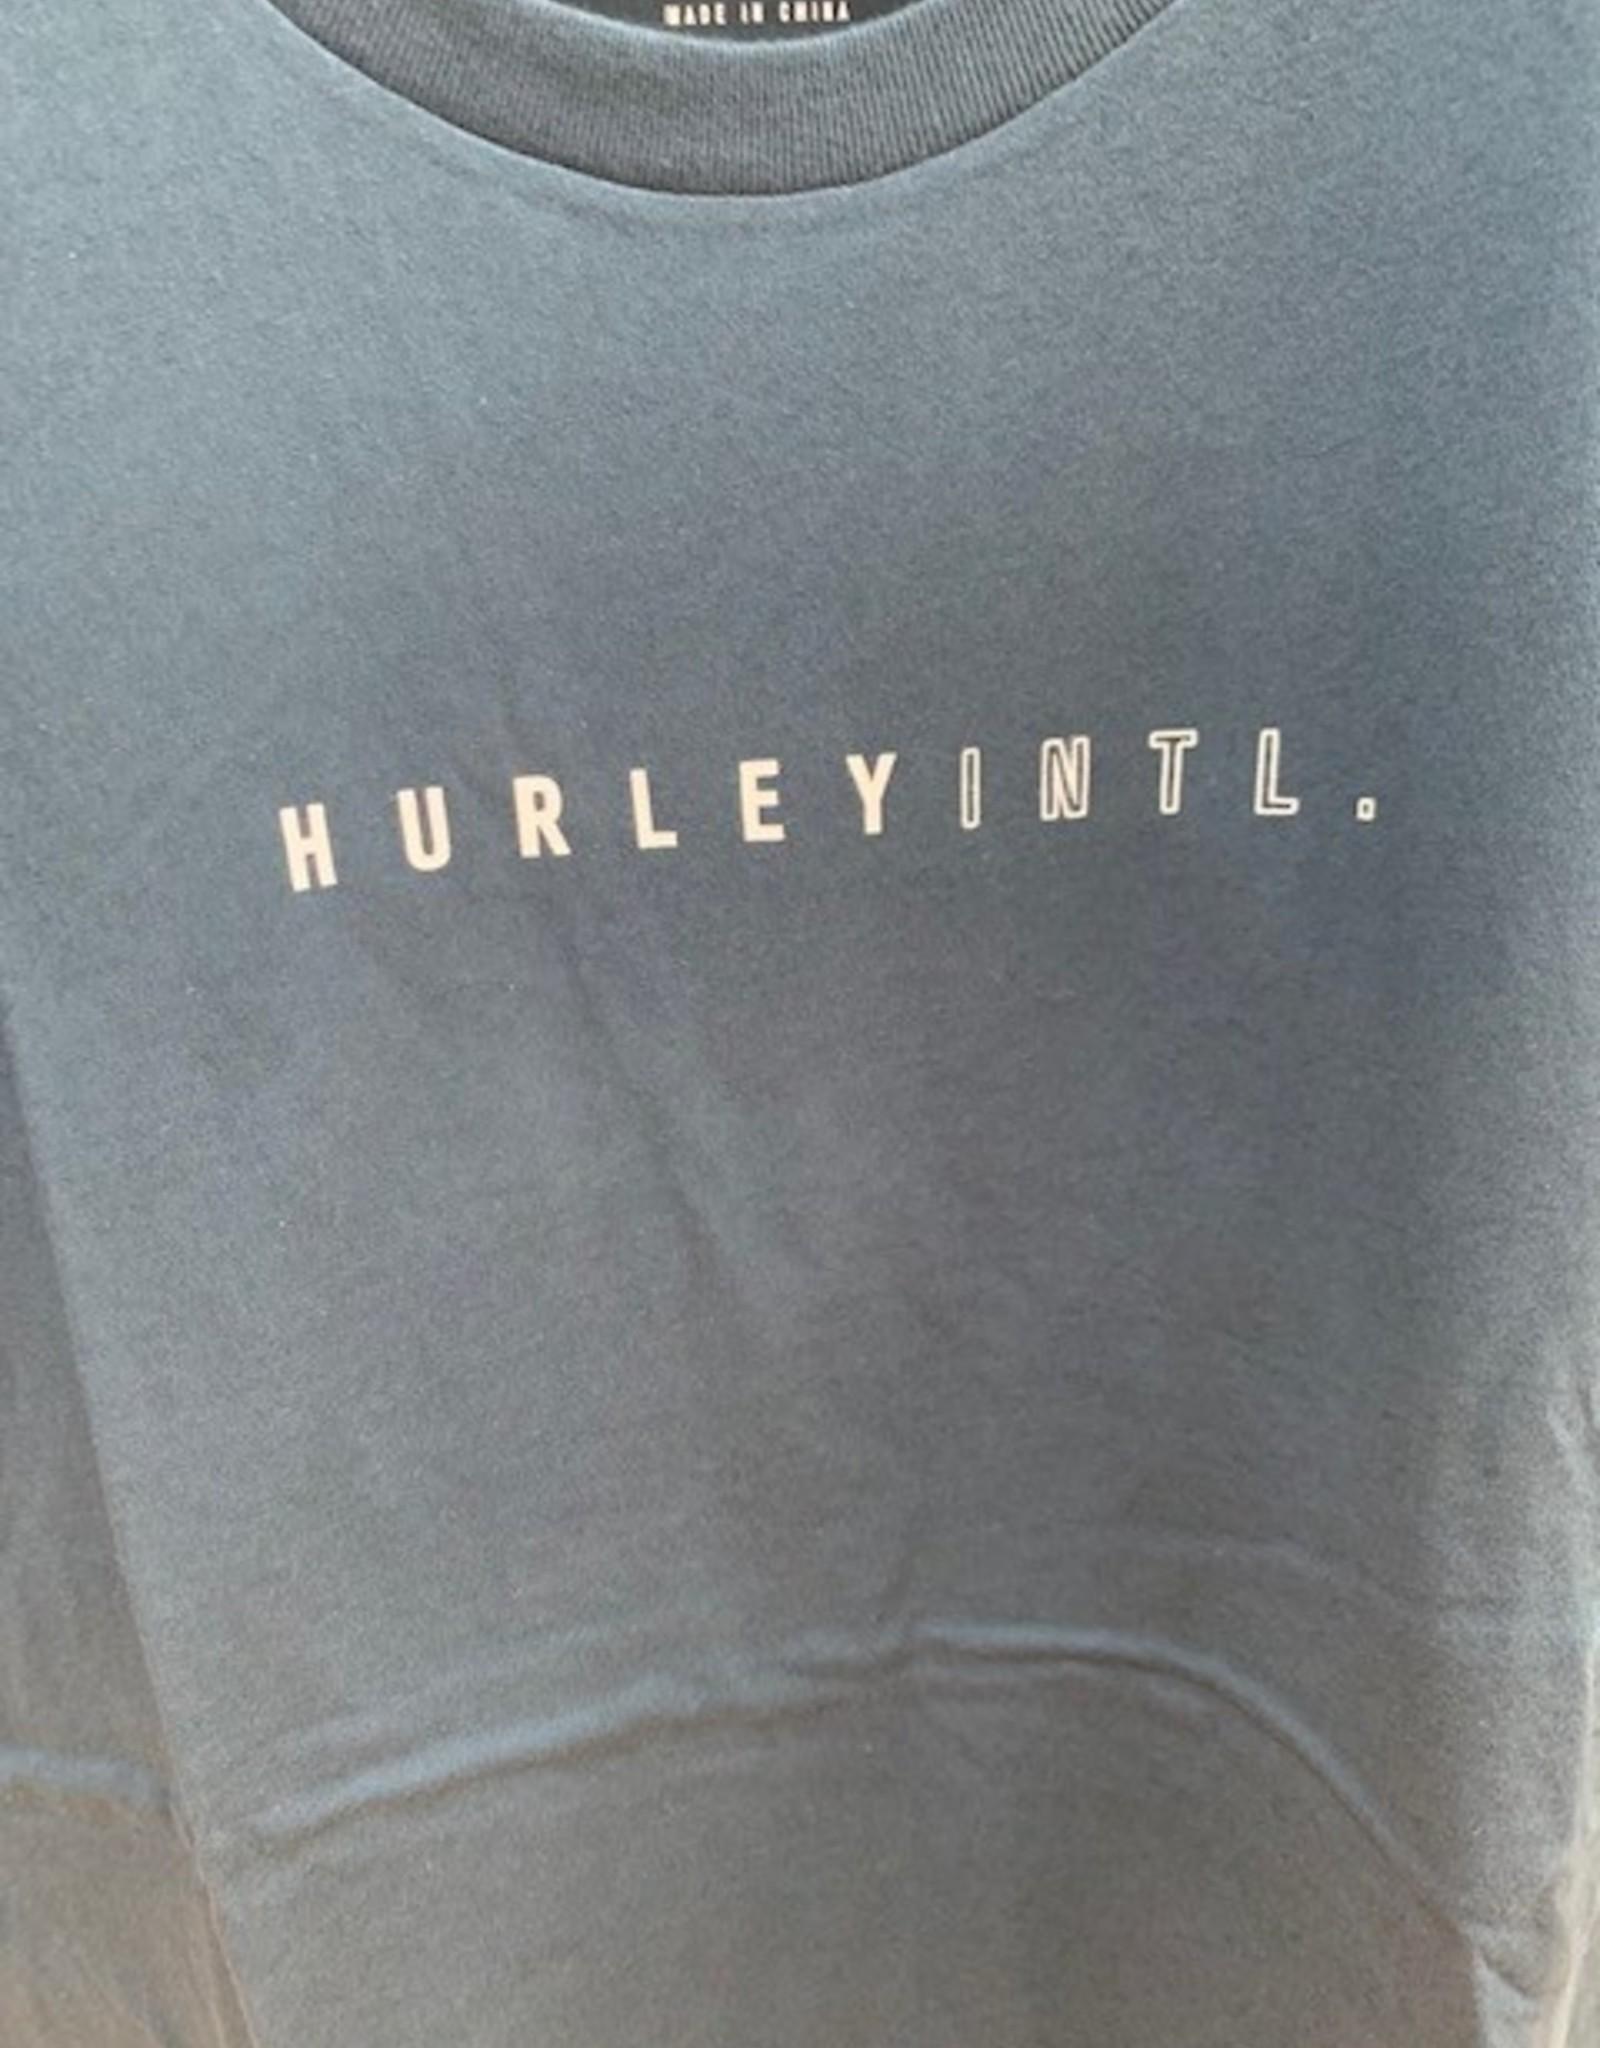 HURLEY Everyday washed Hurley Intl Tee